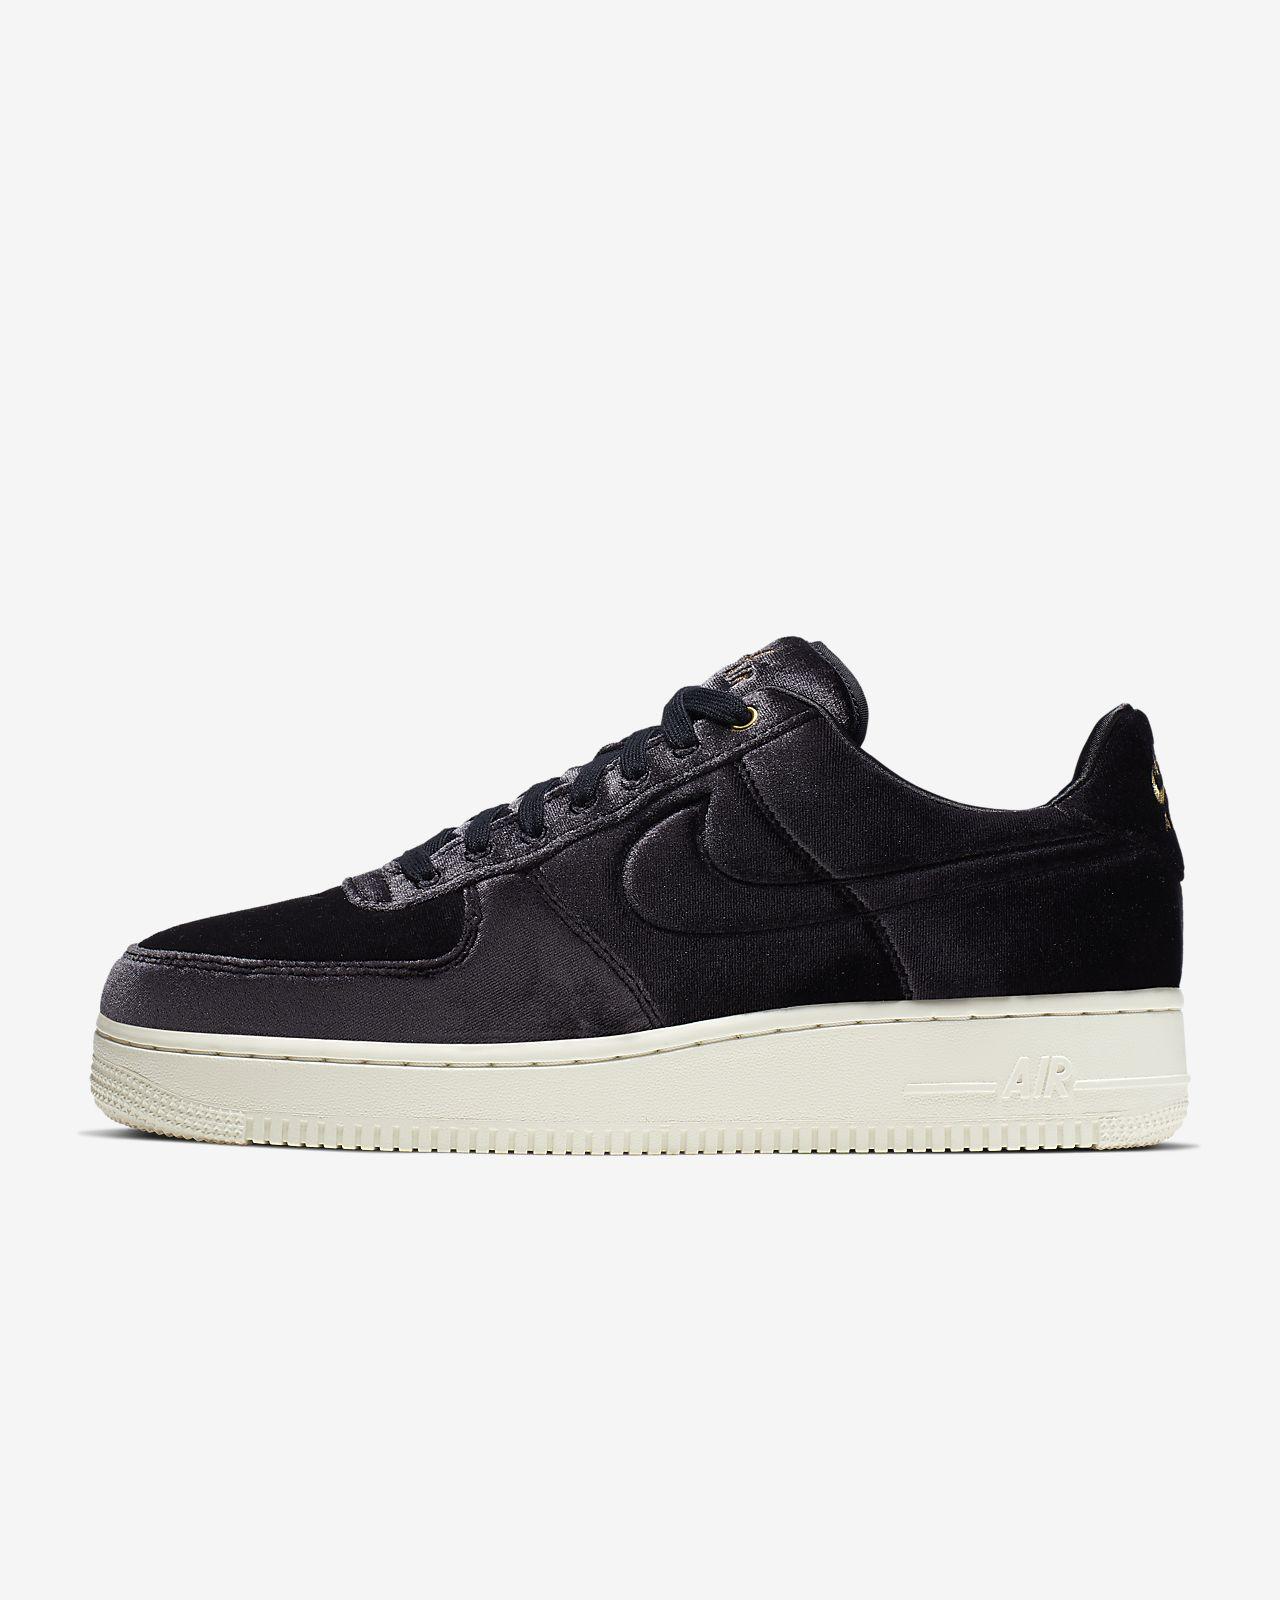 9bf917dd2a06 Nike Air Force 1  07 Premium 3 Men s Shoe. Nike.com GB